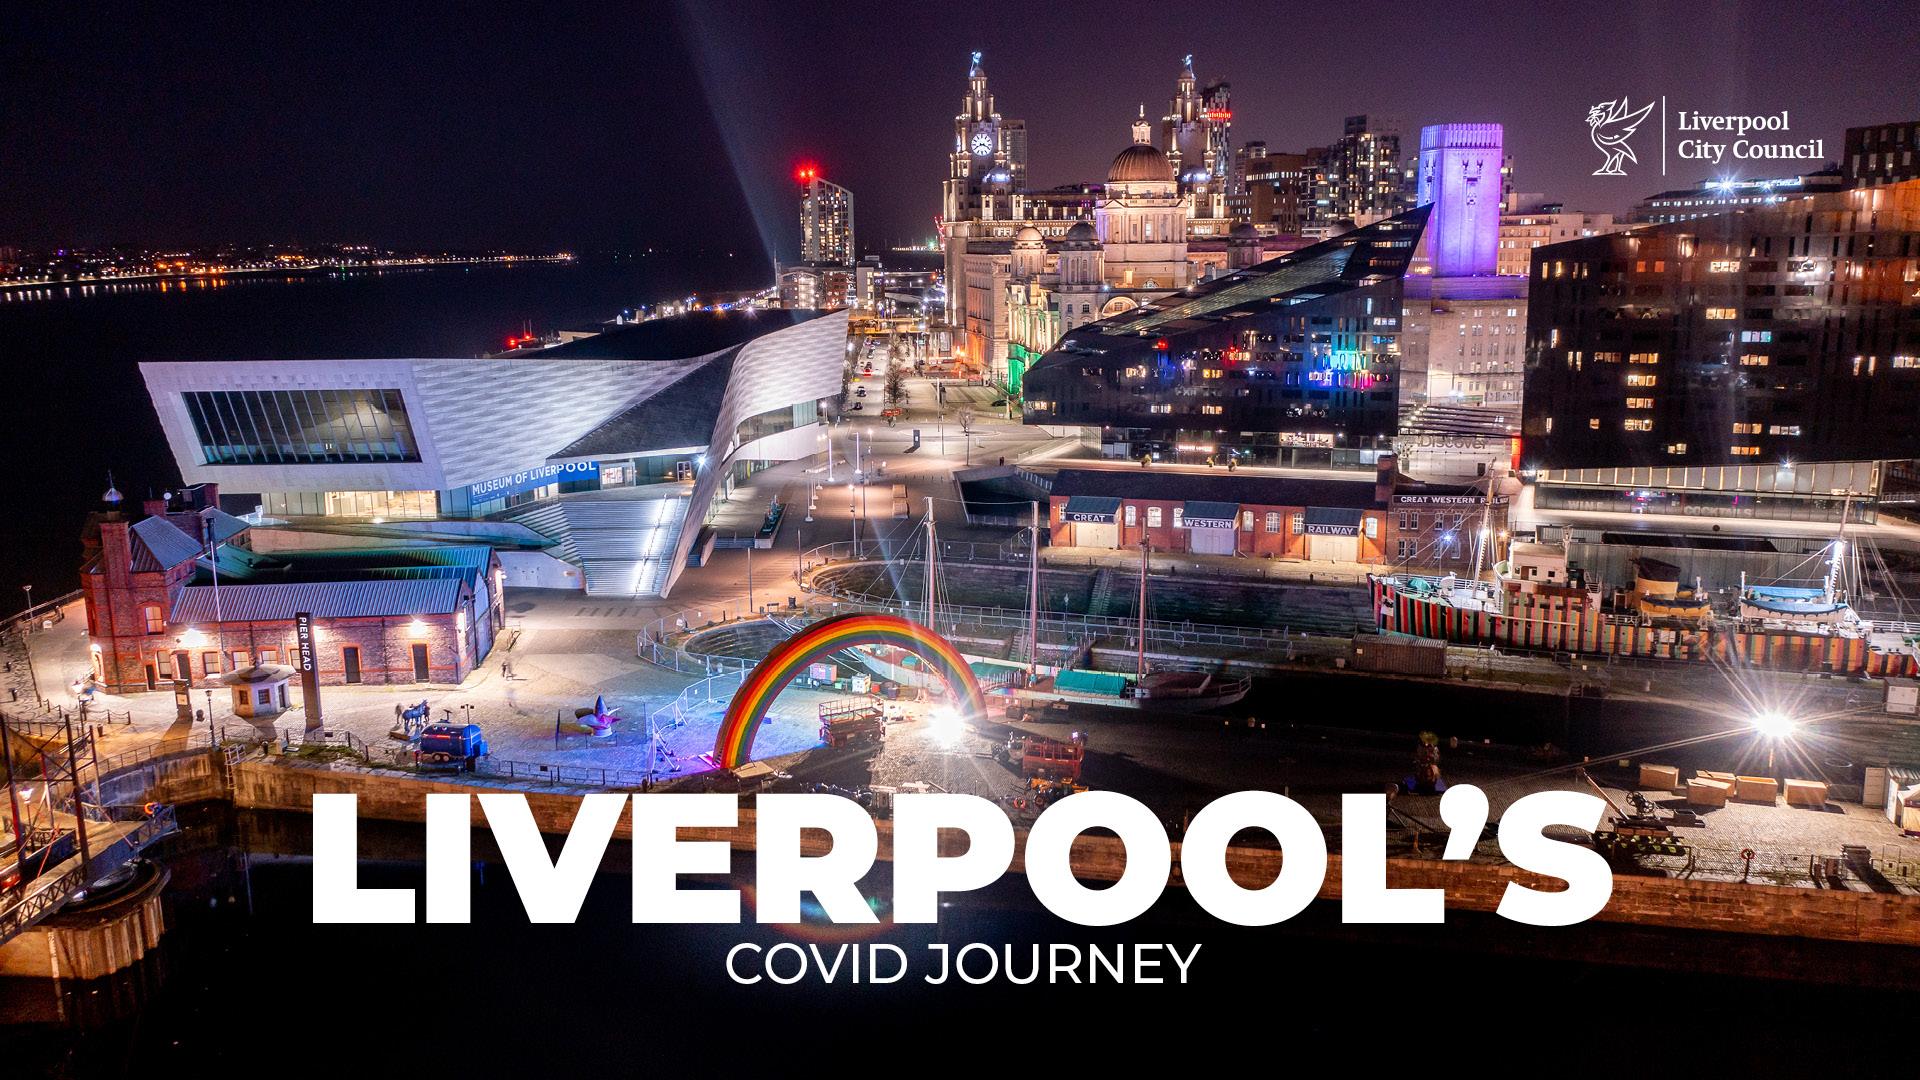 Liverpool's Covid Journey